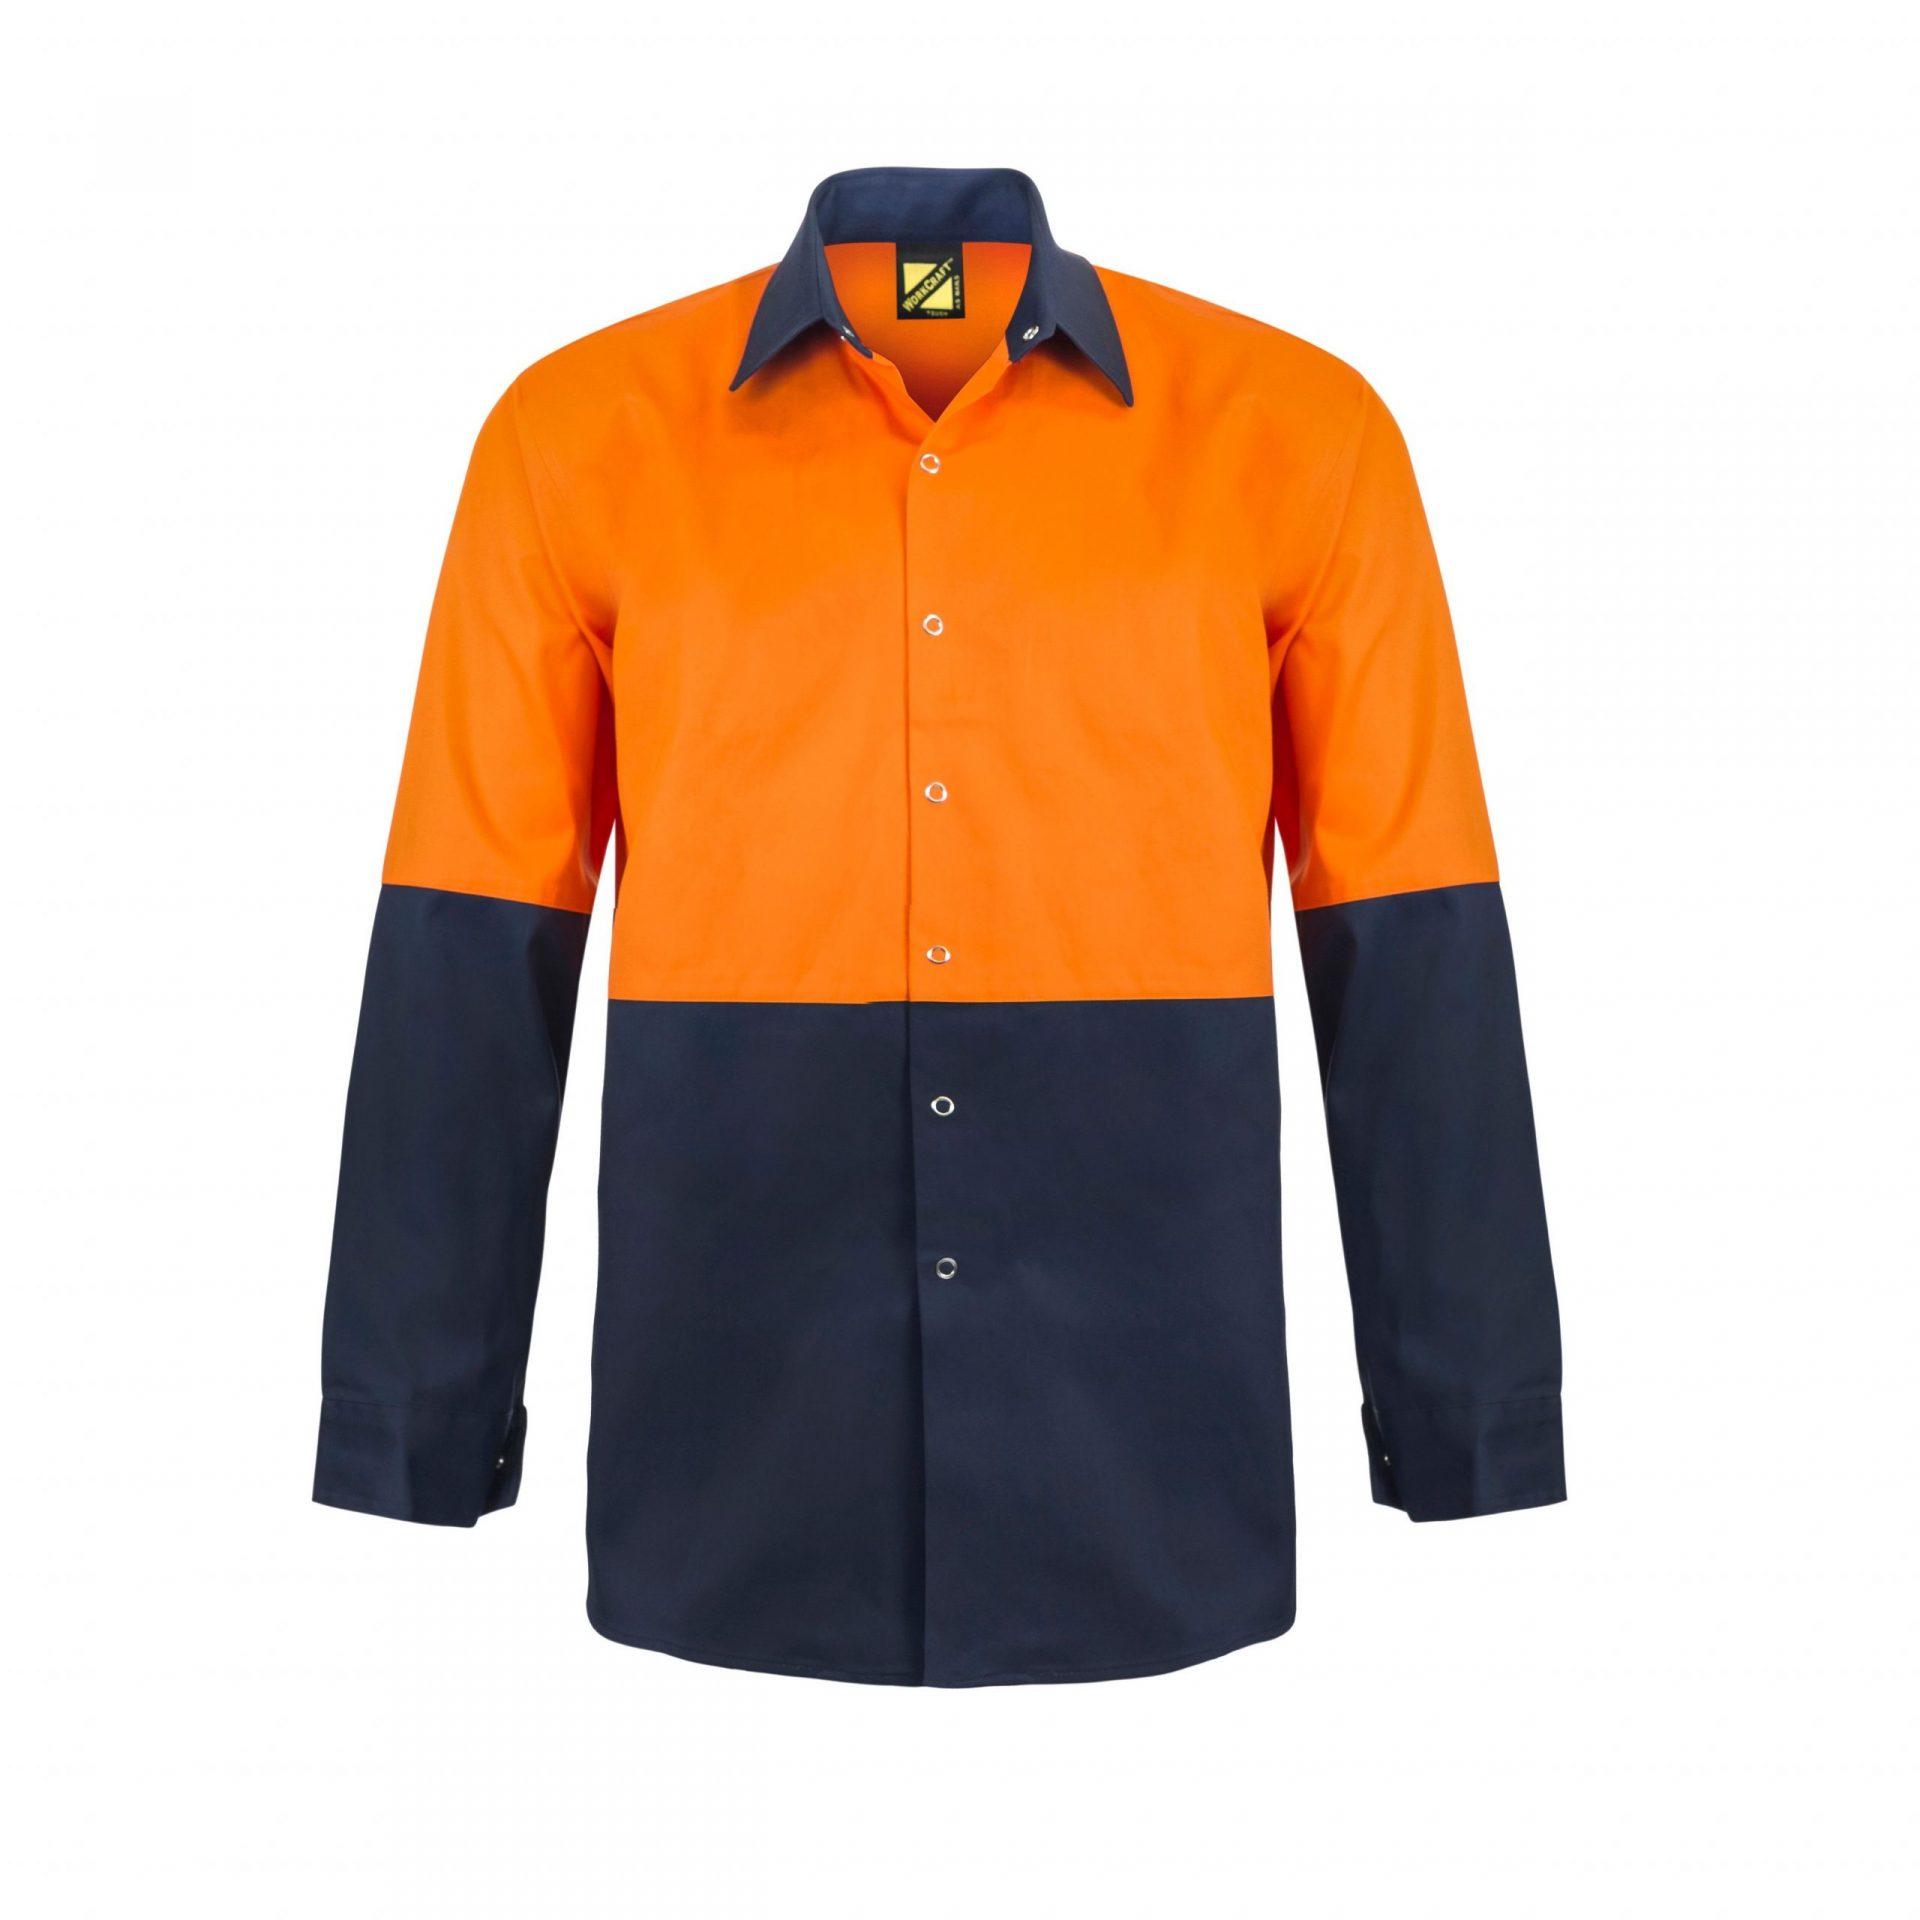 WS3035 orange